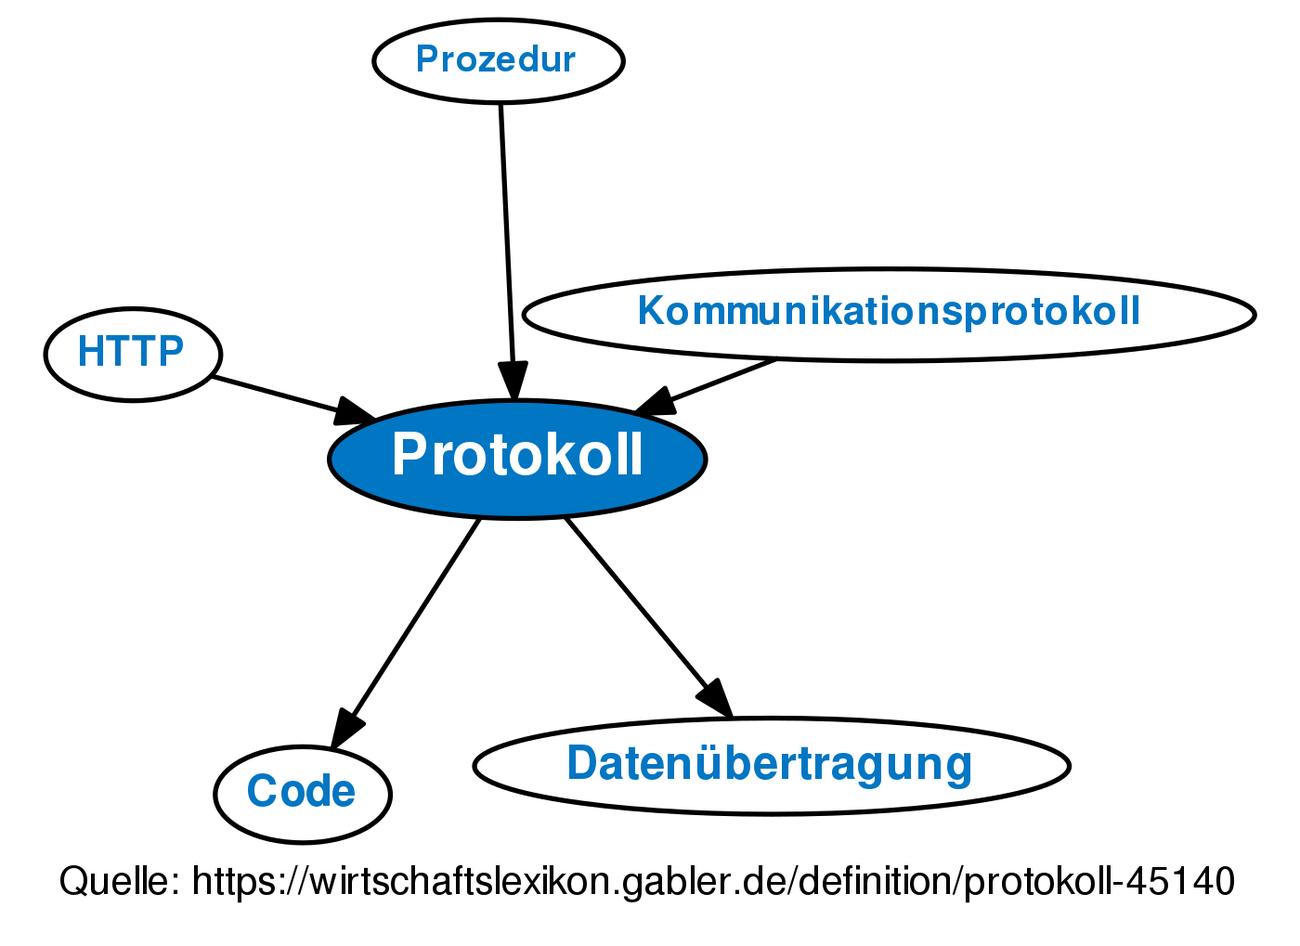 protokol definition